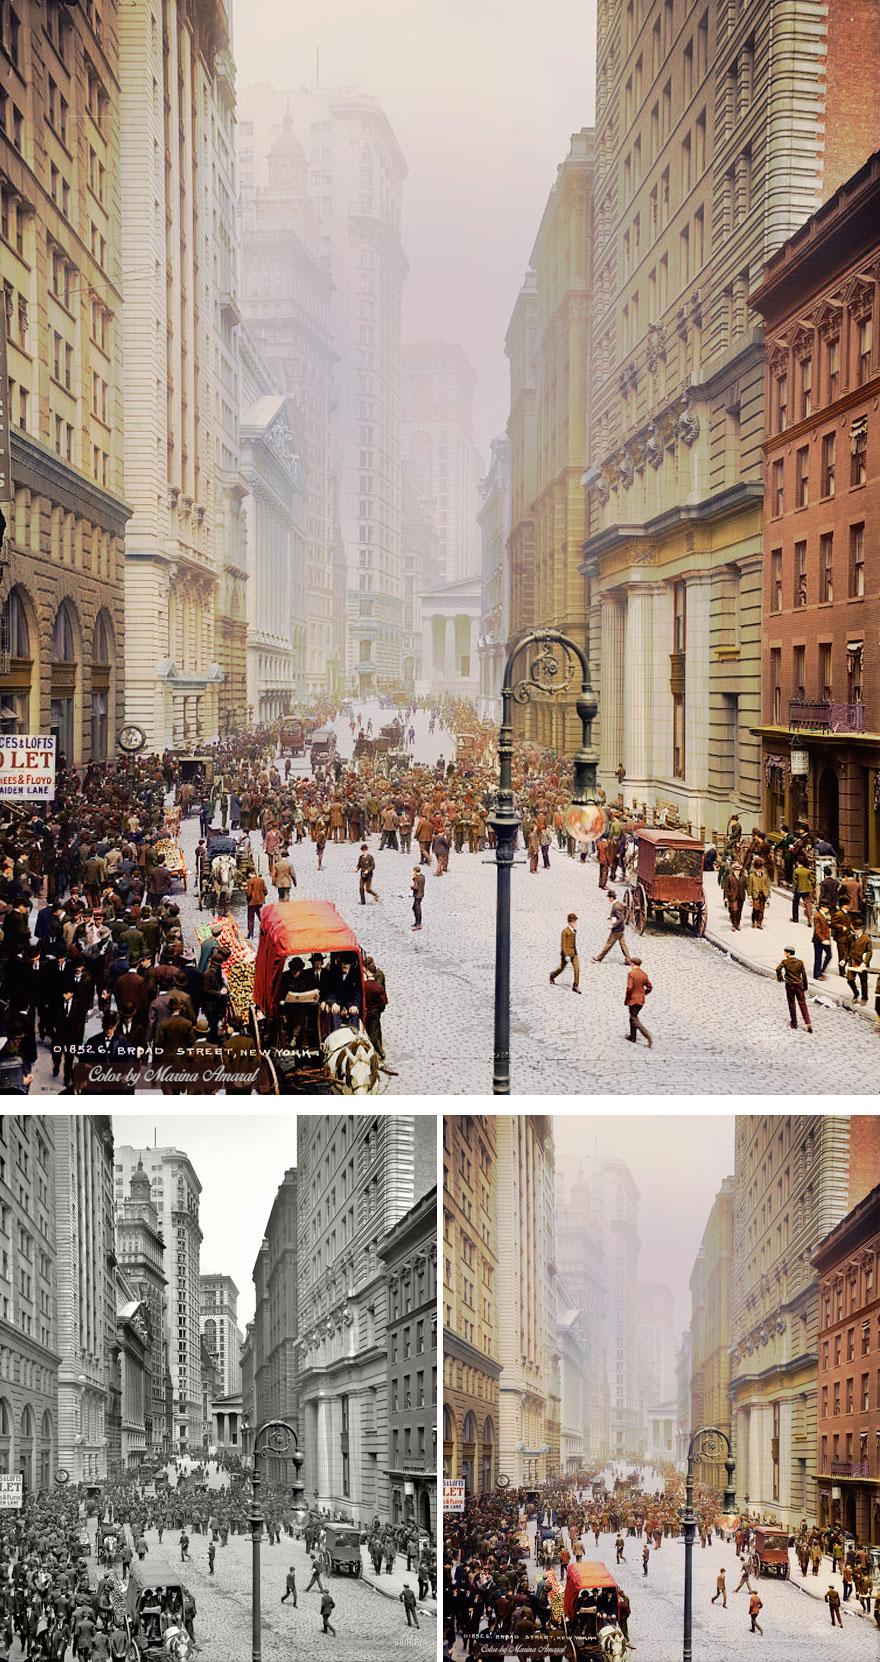 8. Broad Street, New York